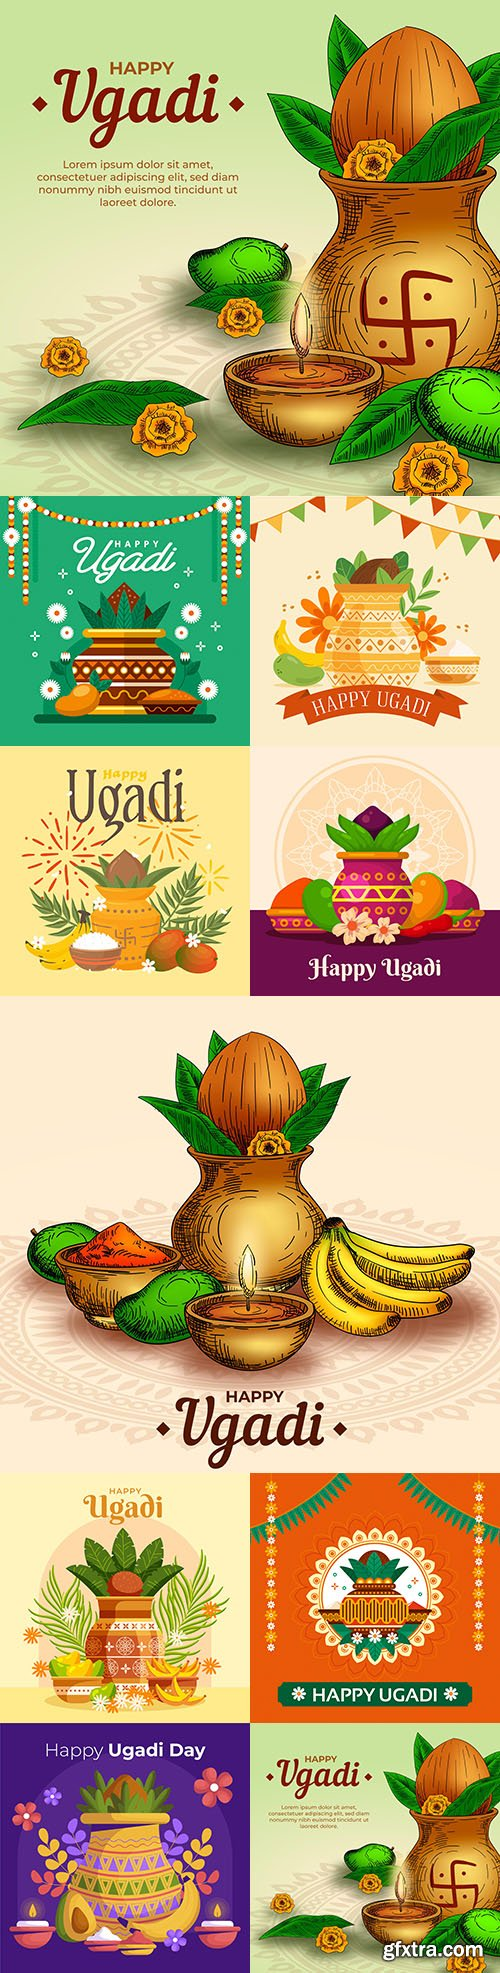 Happy Ugadi decorative illustration flat design